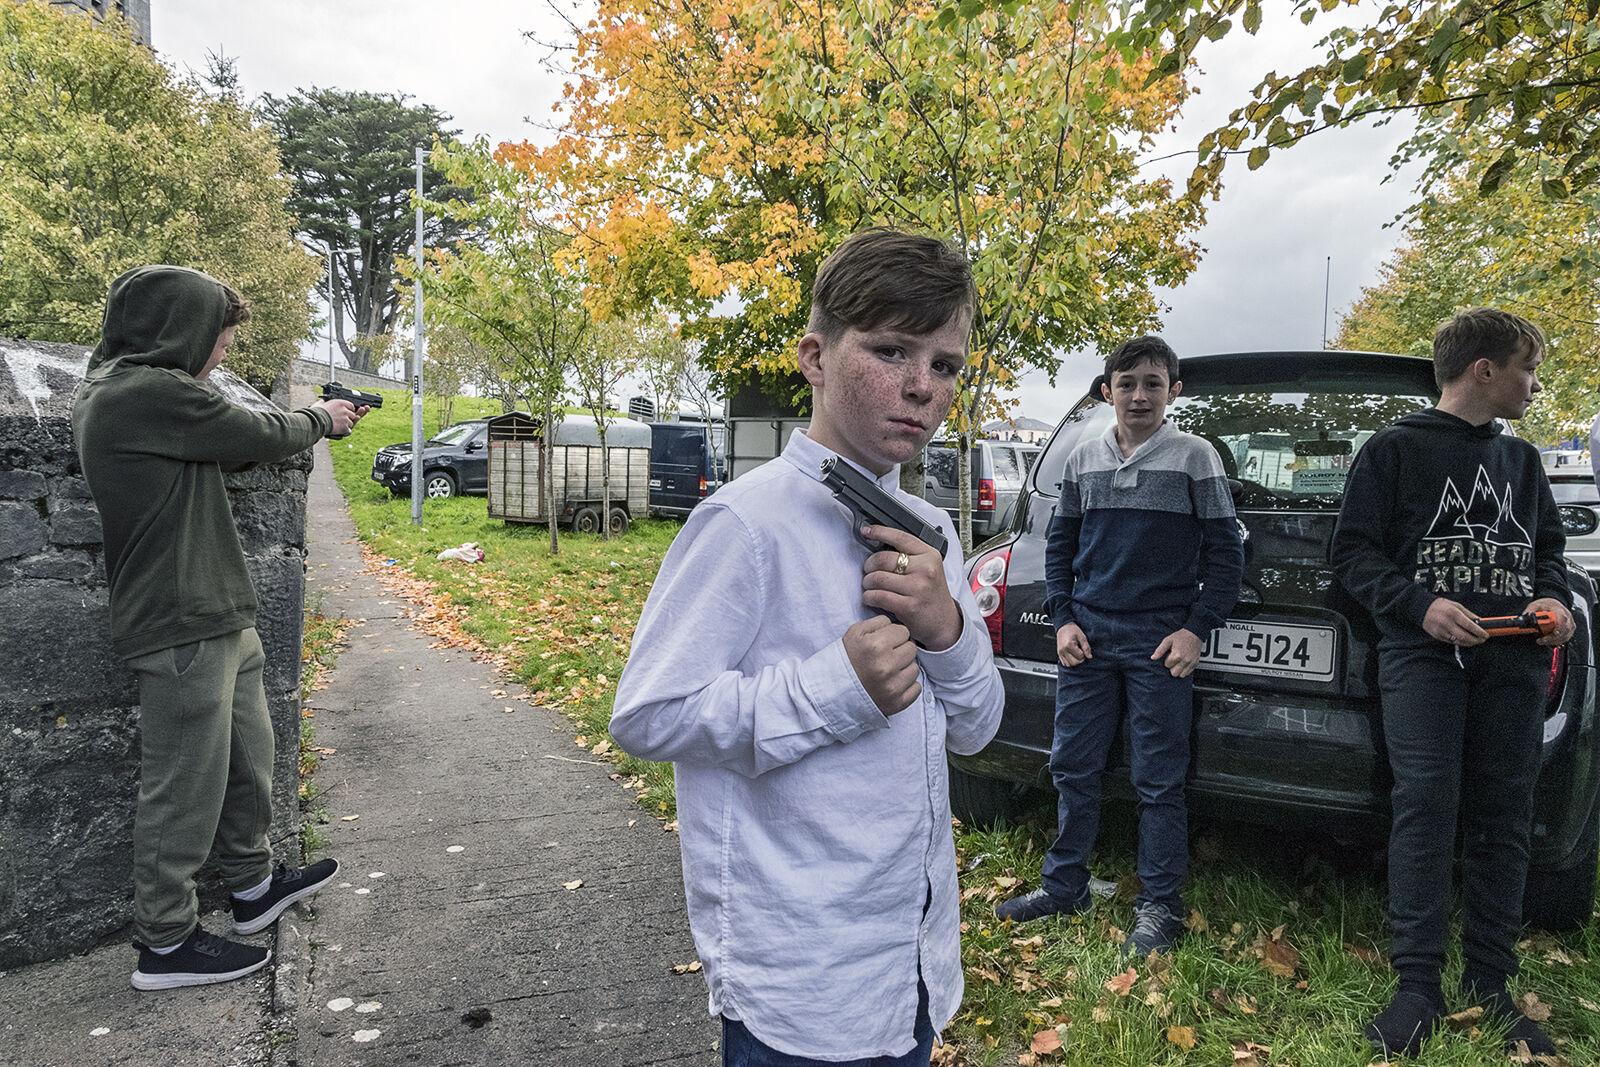 Boys with Pellet Guns, Galway, Ireland 2019